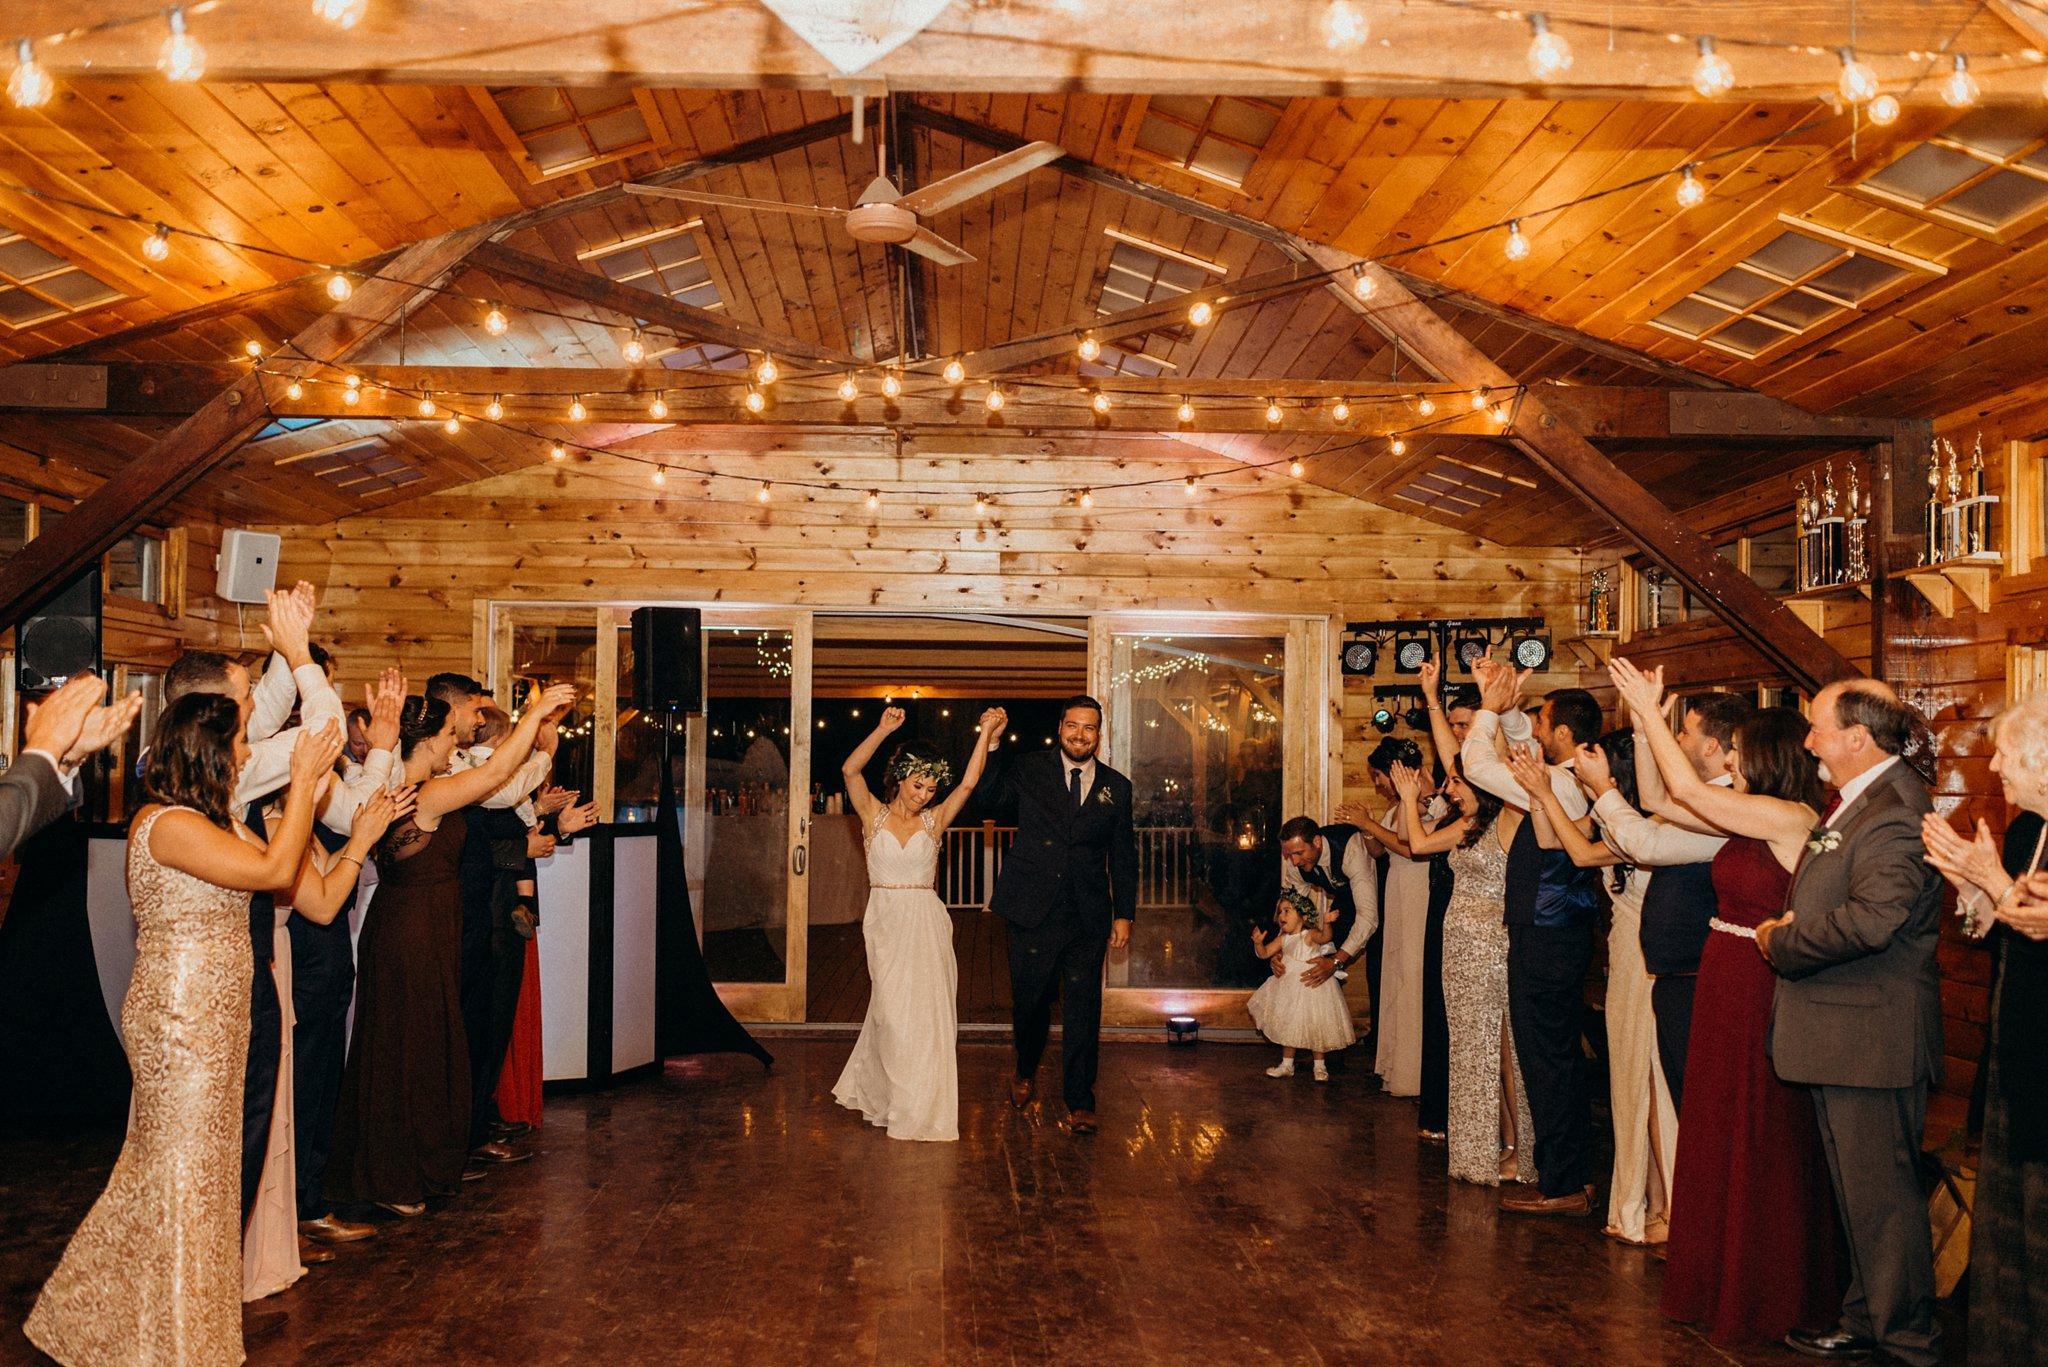 kaihla_tonai_intimate_wedding_elopement_photographer_6667.jpg